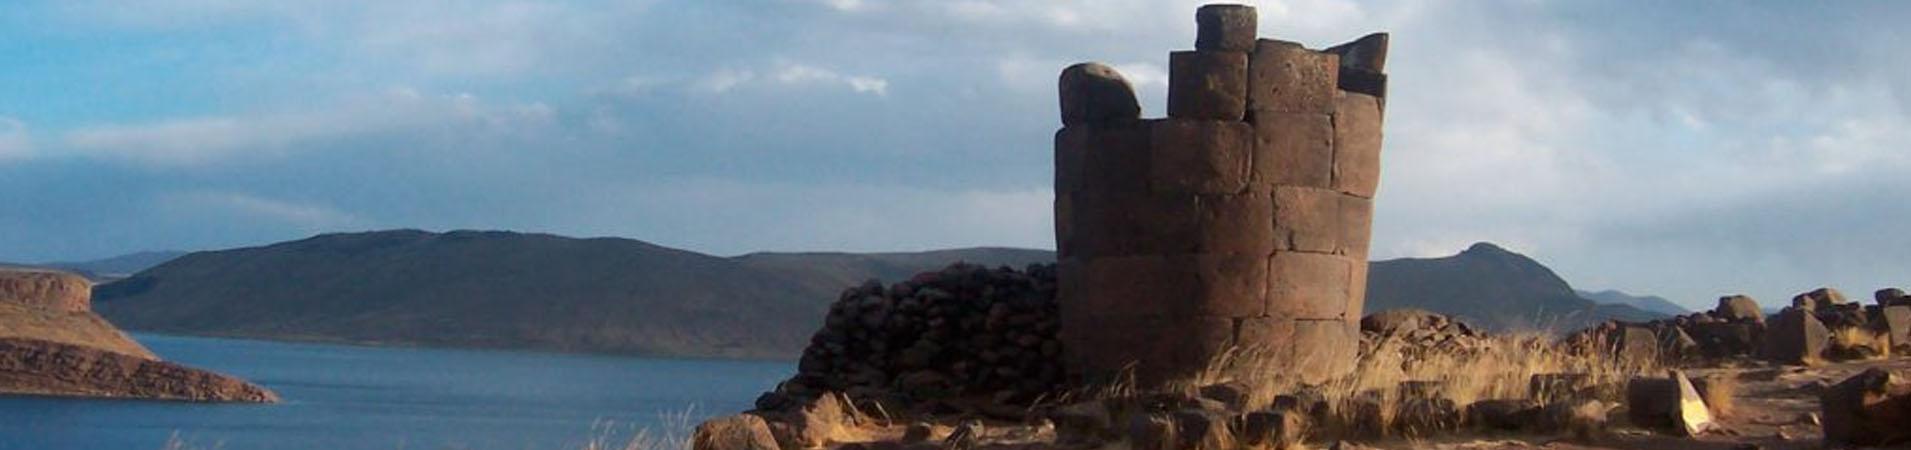 lago titicaca puno uros taquile amantani peru travel agency qori inka